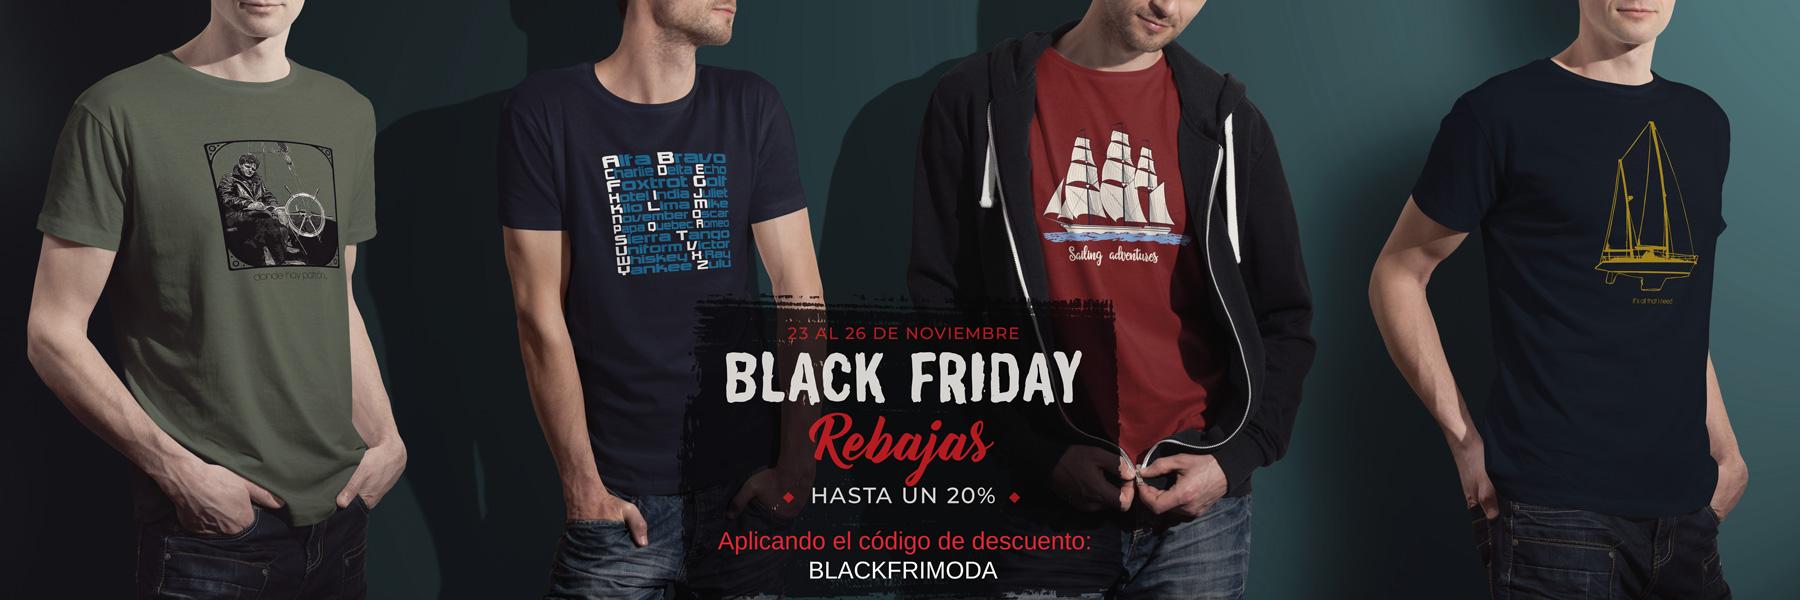 Black Friday Camisetas Marineras